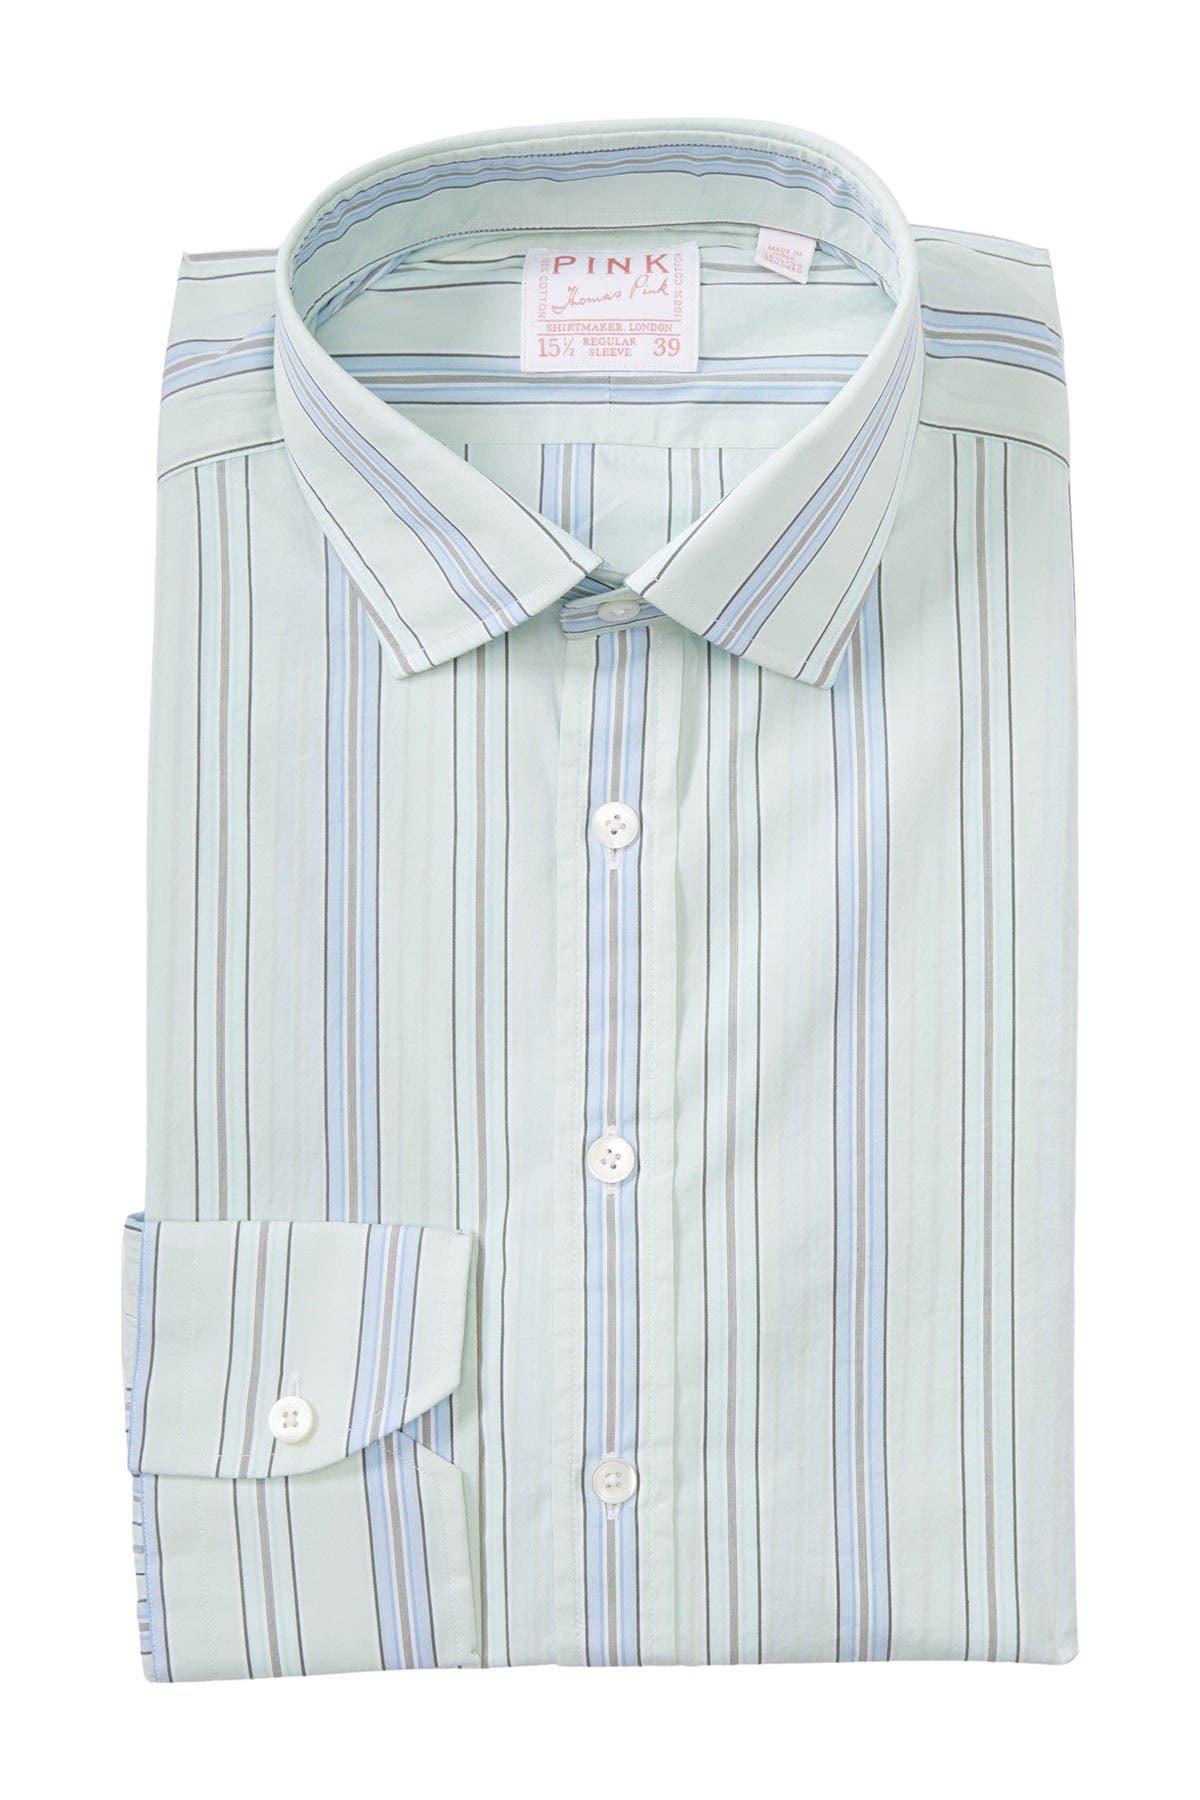 Image of THOMAS PINK Piumino Stripe Print Dress Shirt